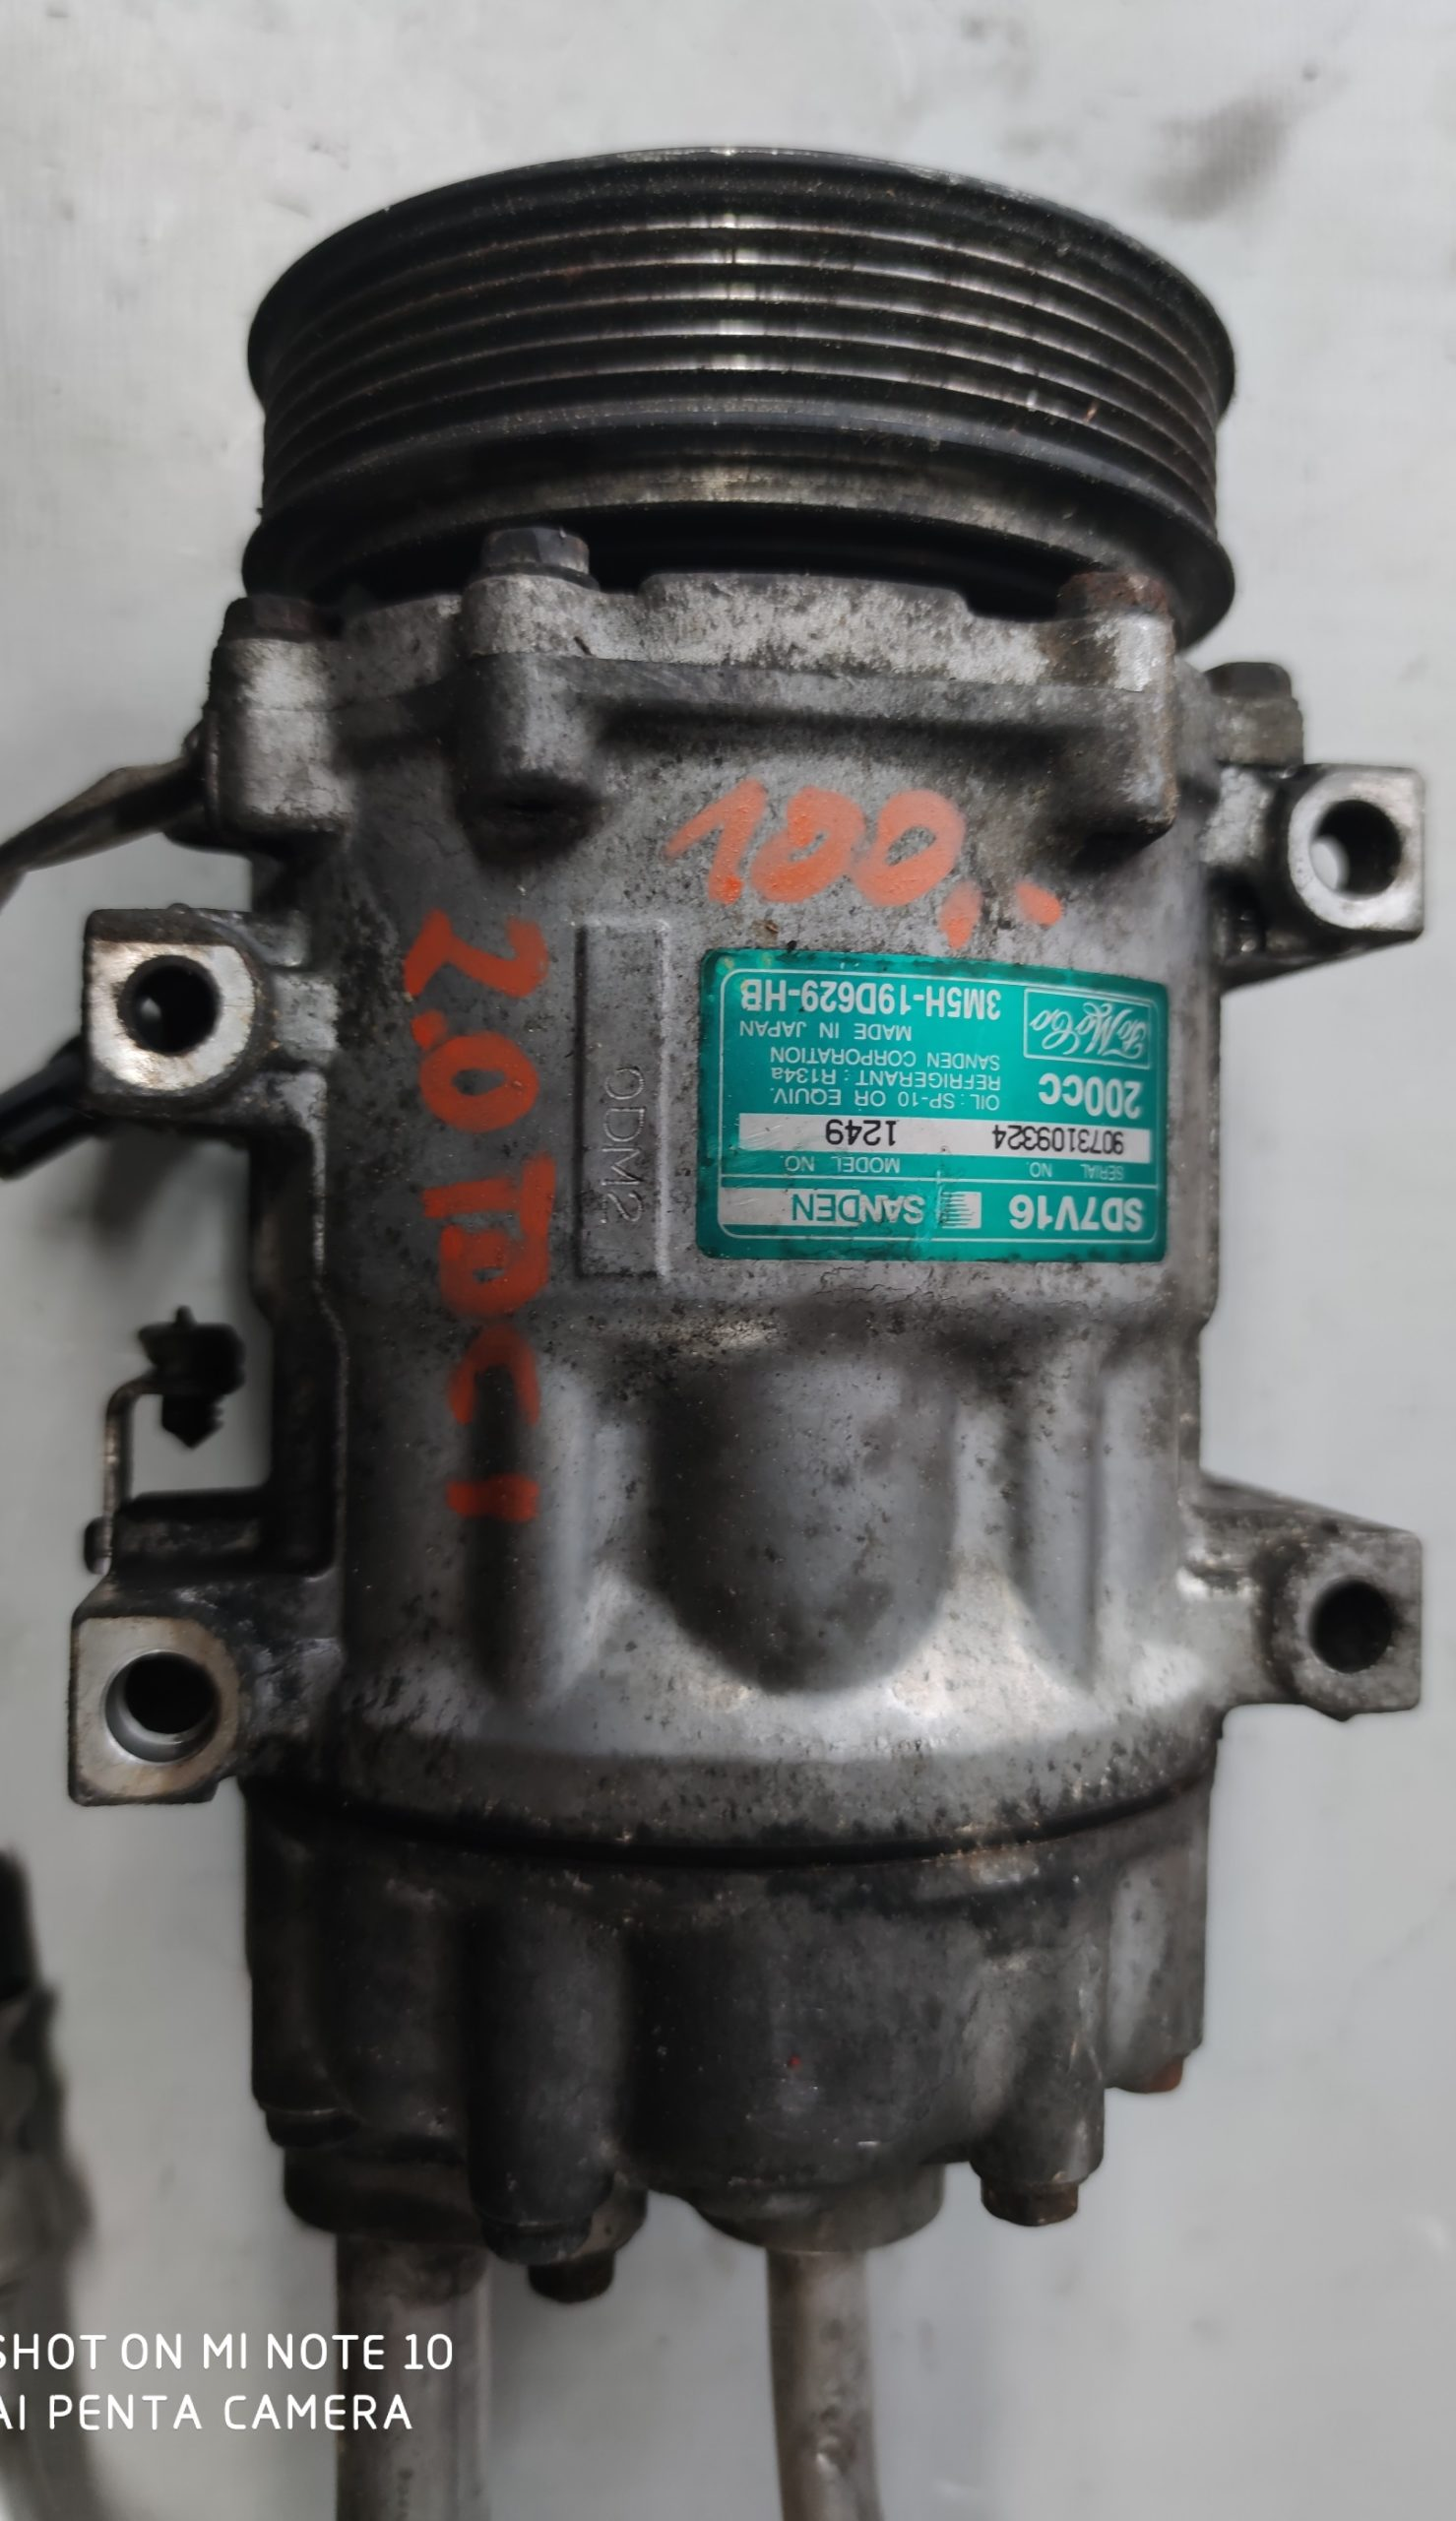 Sprężarka Klimatyzacji Ford 2.0 TDCI 3M5H-19D629-HB